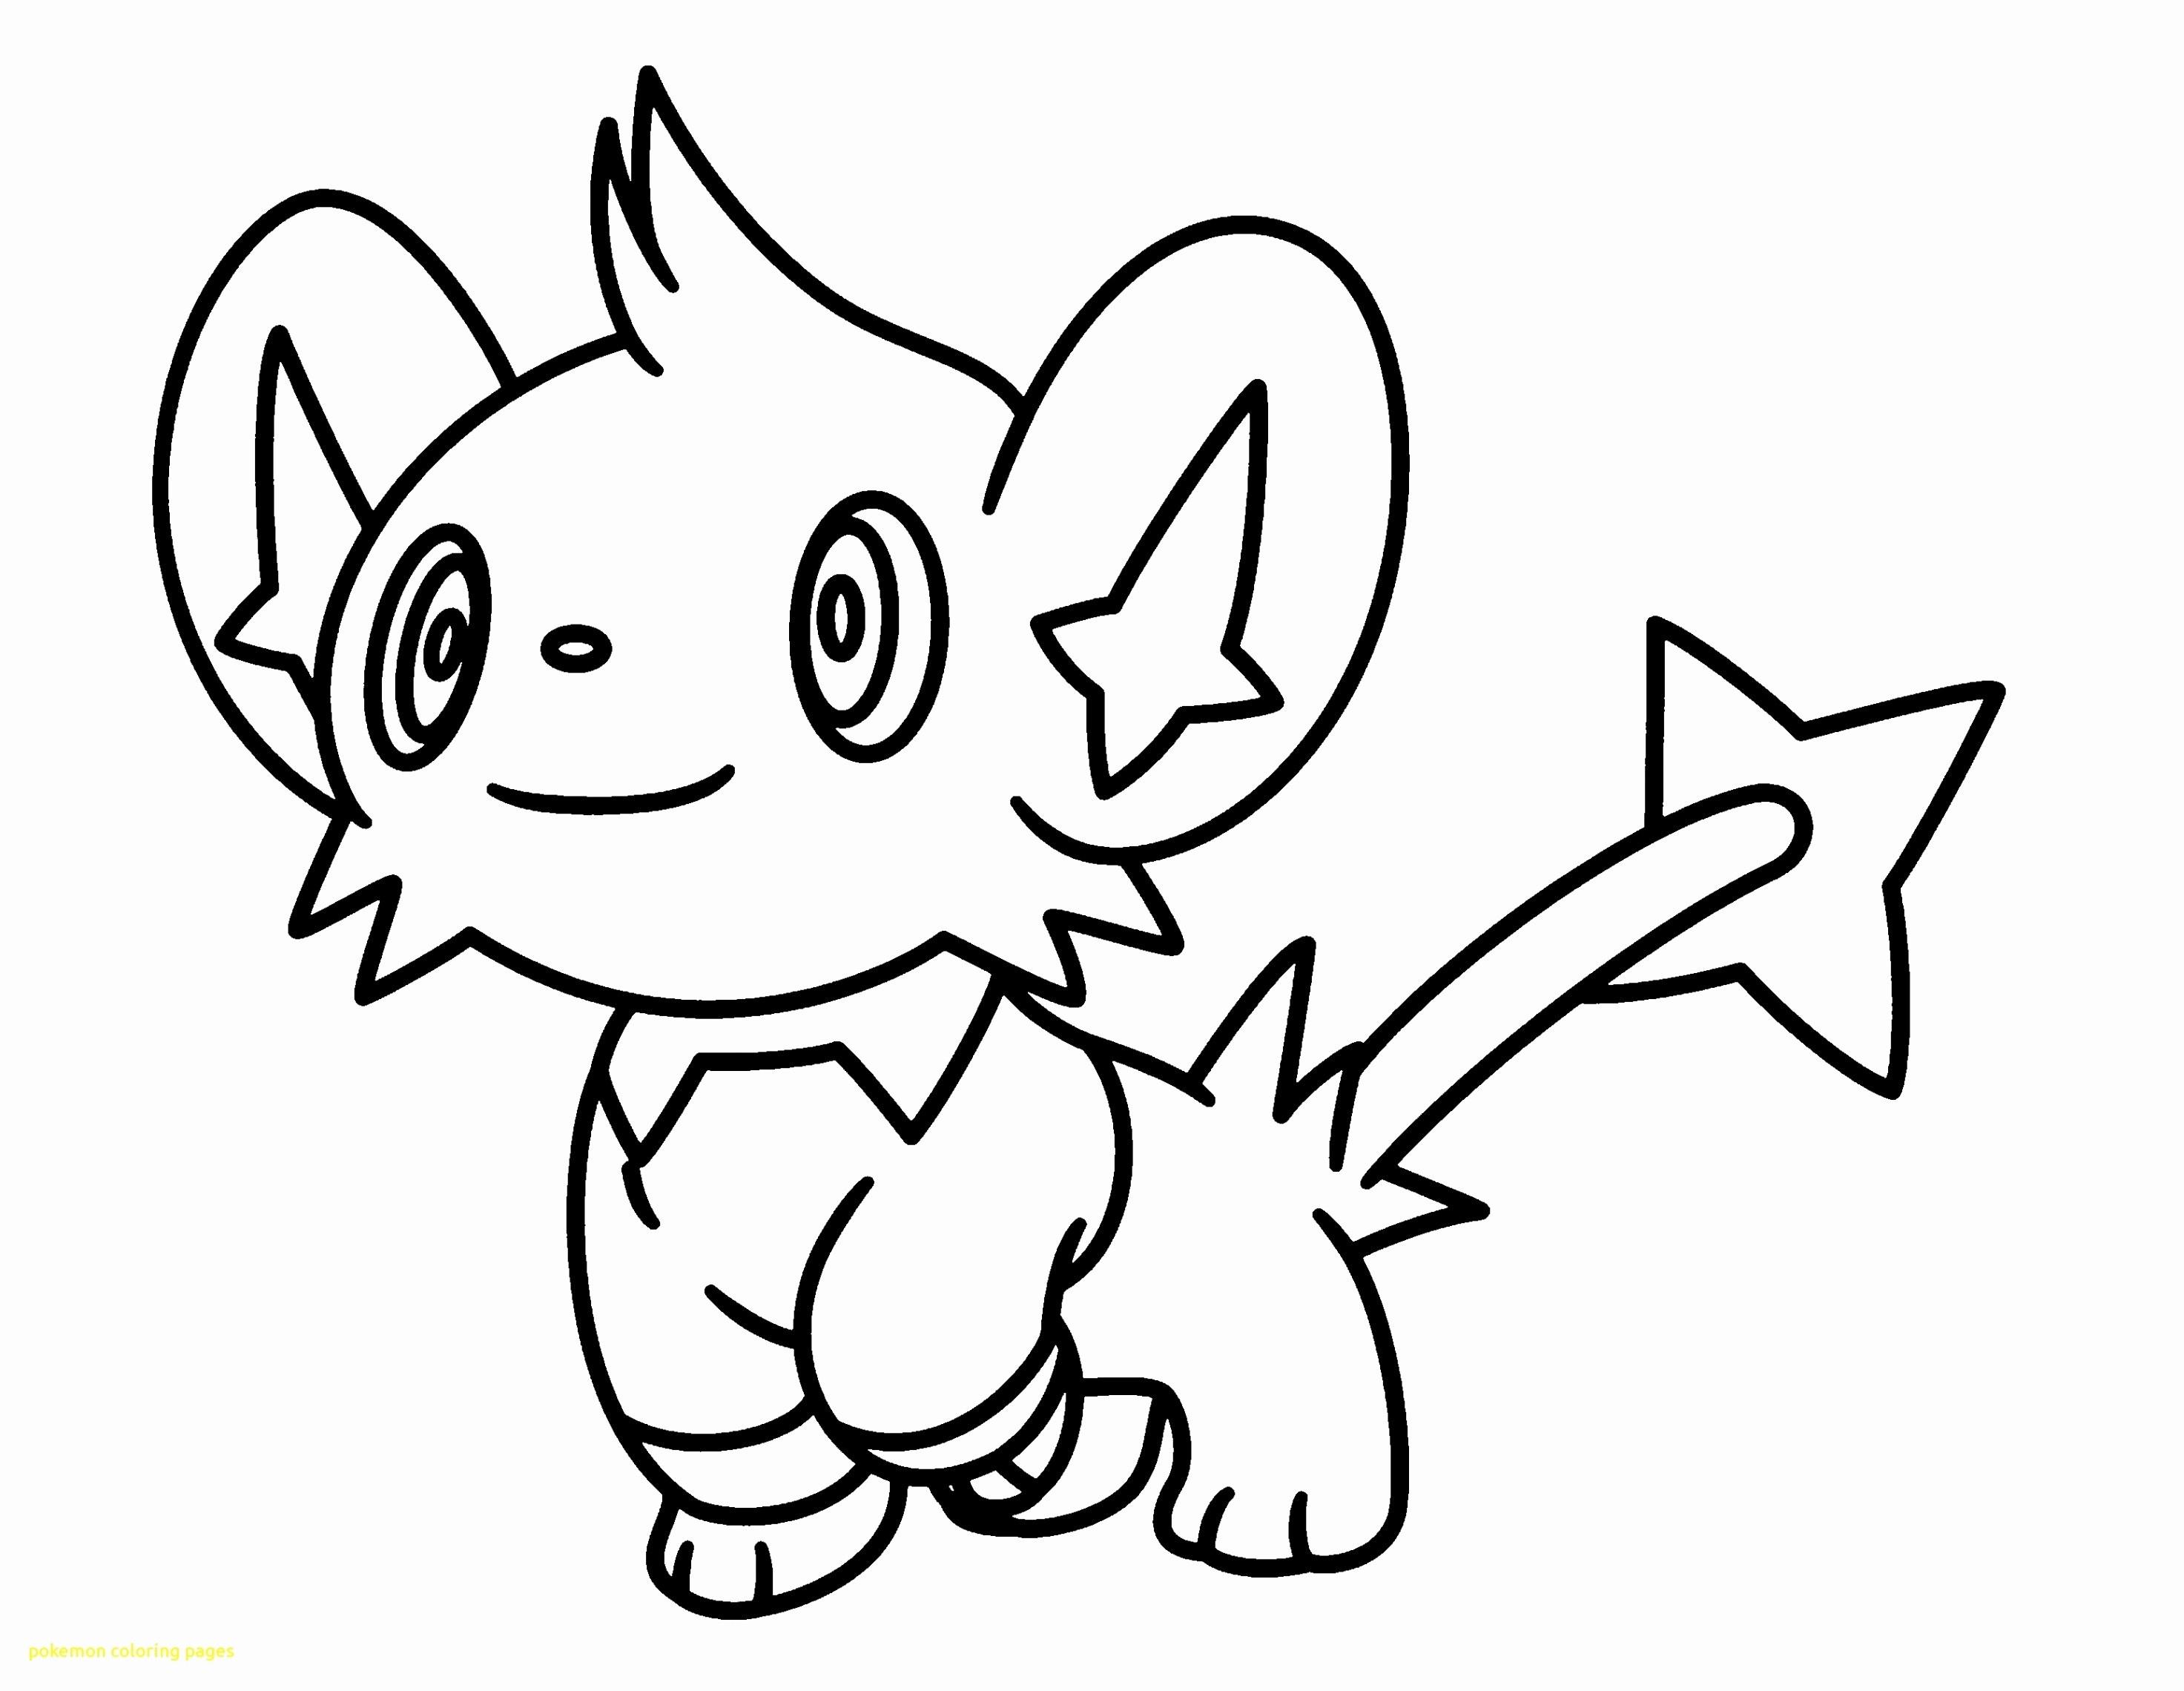 Free Printable Pokemon Coloring Pages Free Printable Coloring Pages - Free Printable Coloring Pages Pokemon Black White